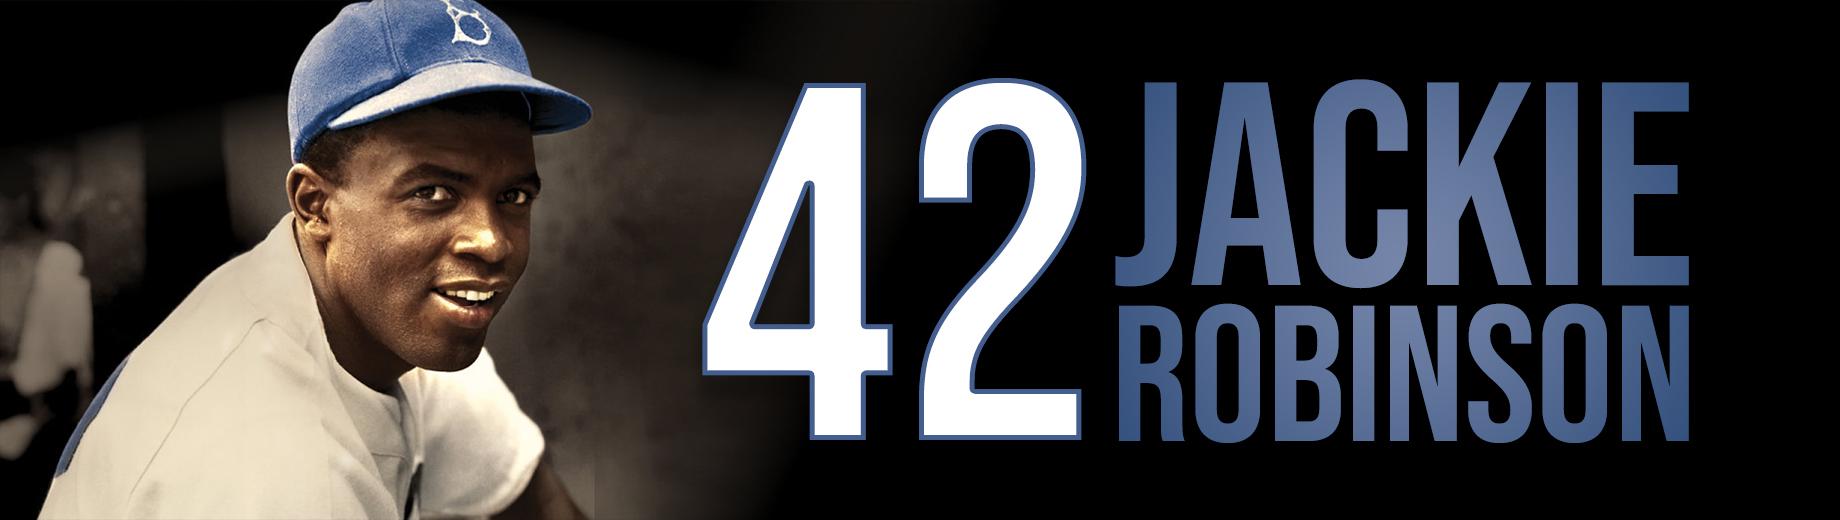 jackie-robinson.jpg